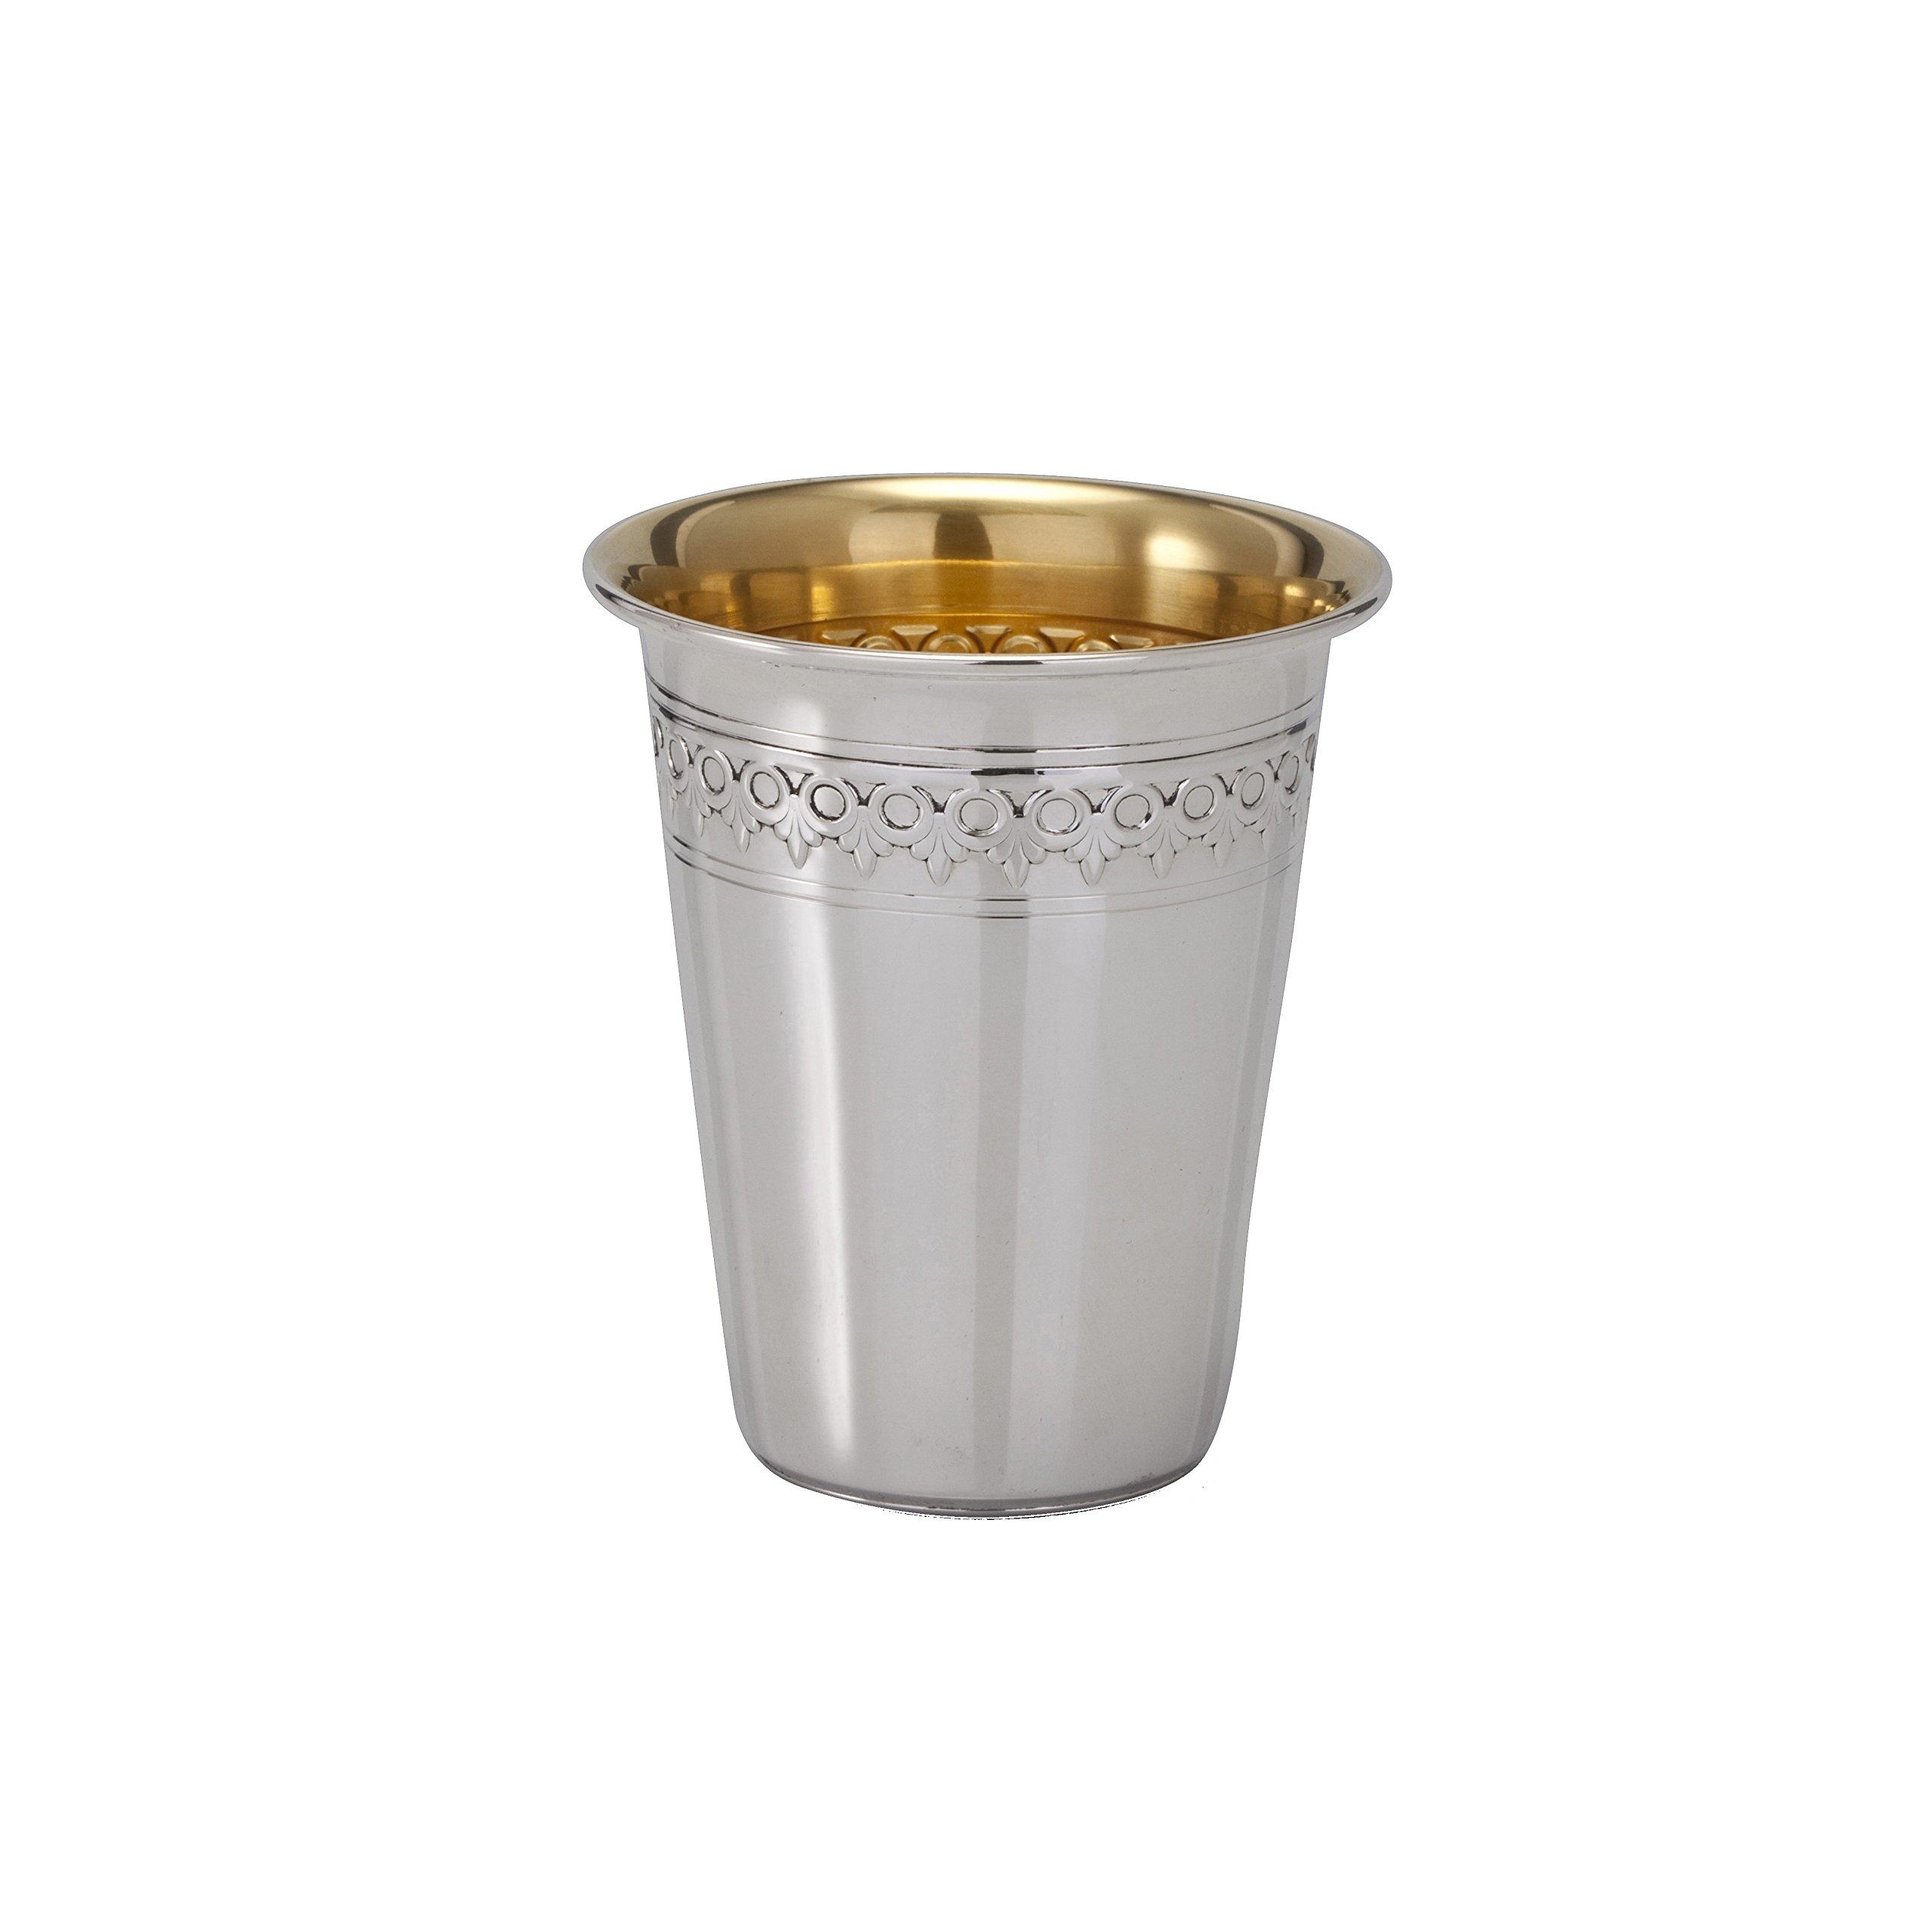 Hazorfim Filigree Chazon Ish Kiddush Cup Sterling silver 925 kiddush cup saucer plate wine shabbat Shabbos bar mitzva wedding gift handmade Israel Judaica hatzorfim